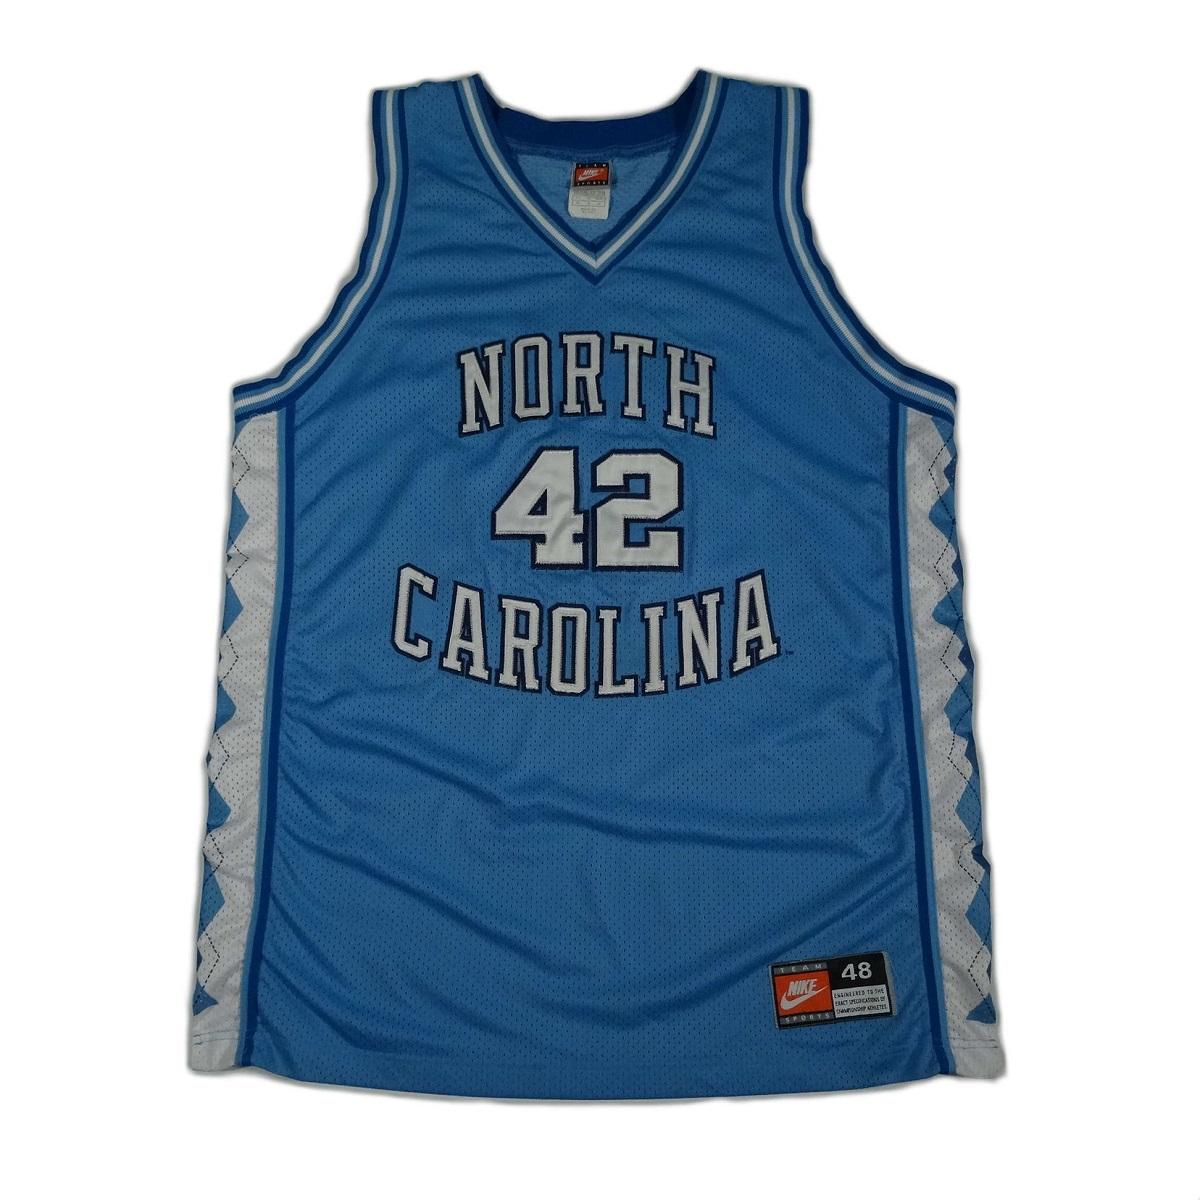 North Carolina Tar Heels Basketball Vintage Nike Jersey Front